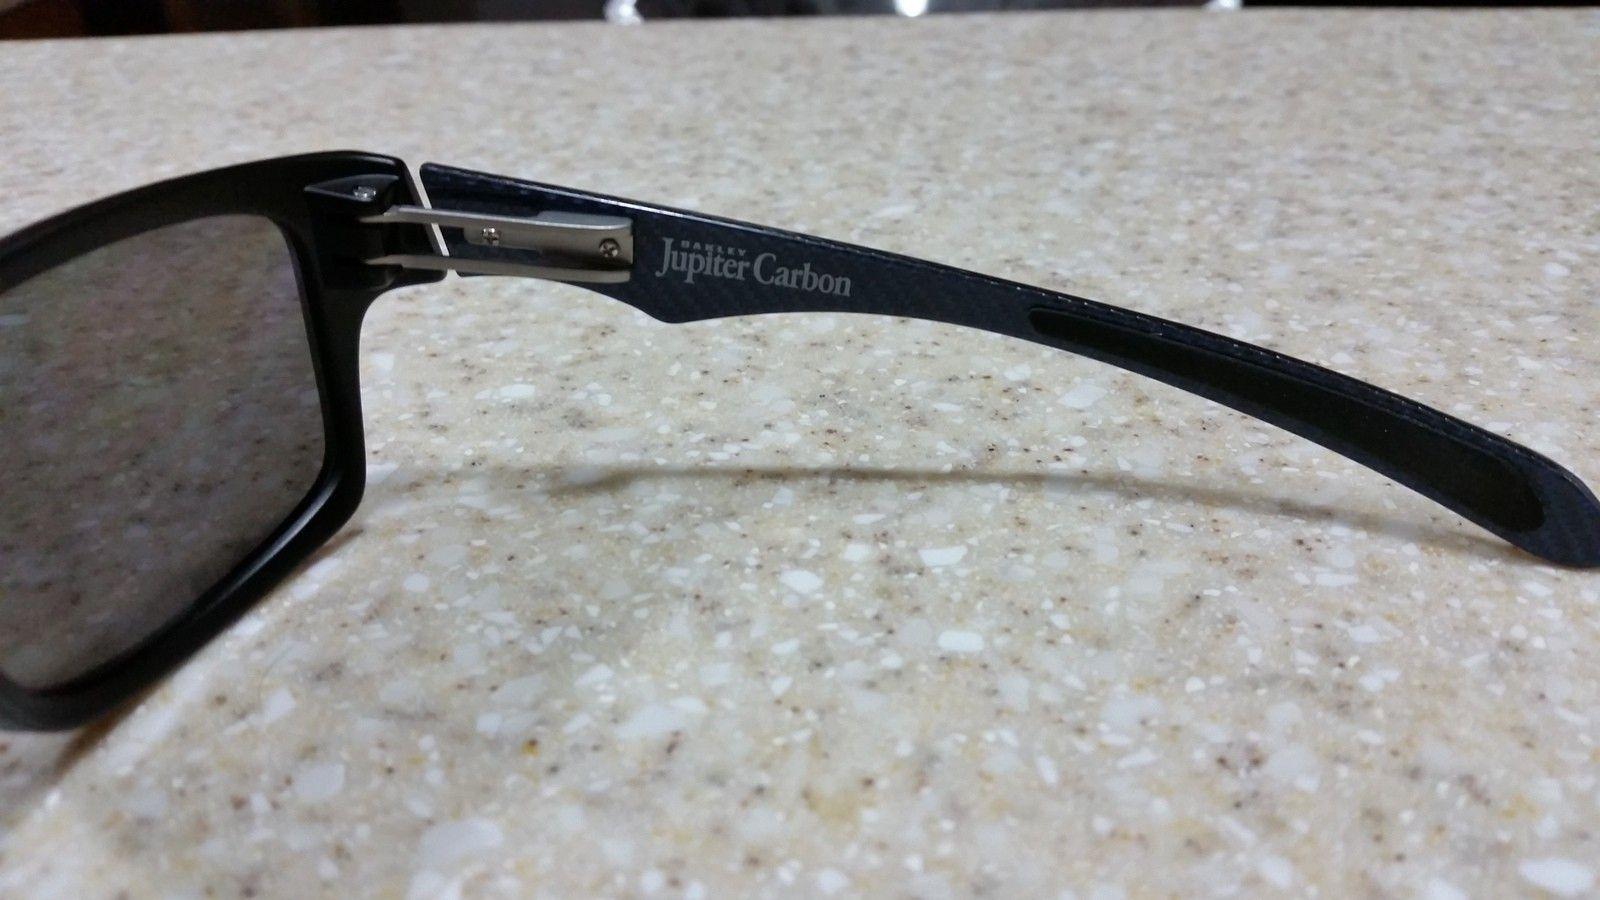 OAKLEY JUPITER CARBON MATTE BLACK/ICE IRIDIUM POLARIZED - JFC (4).jpg